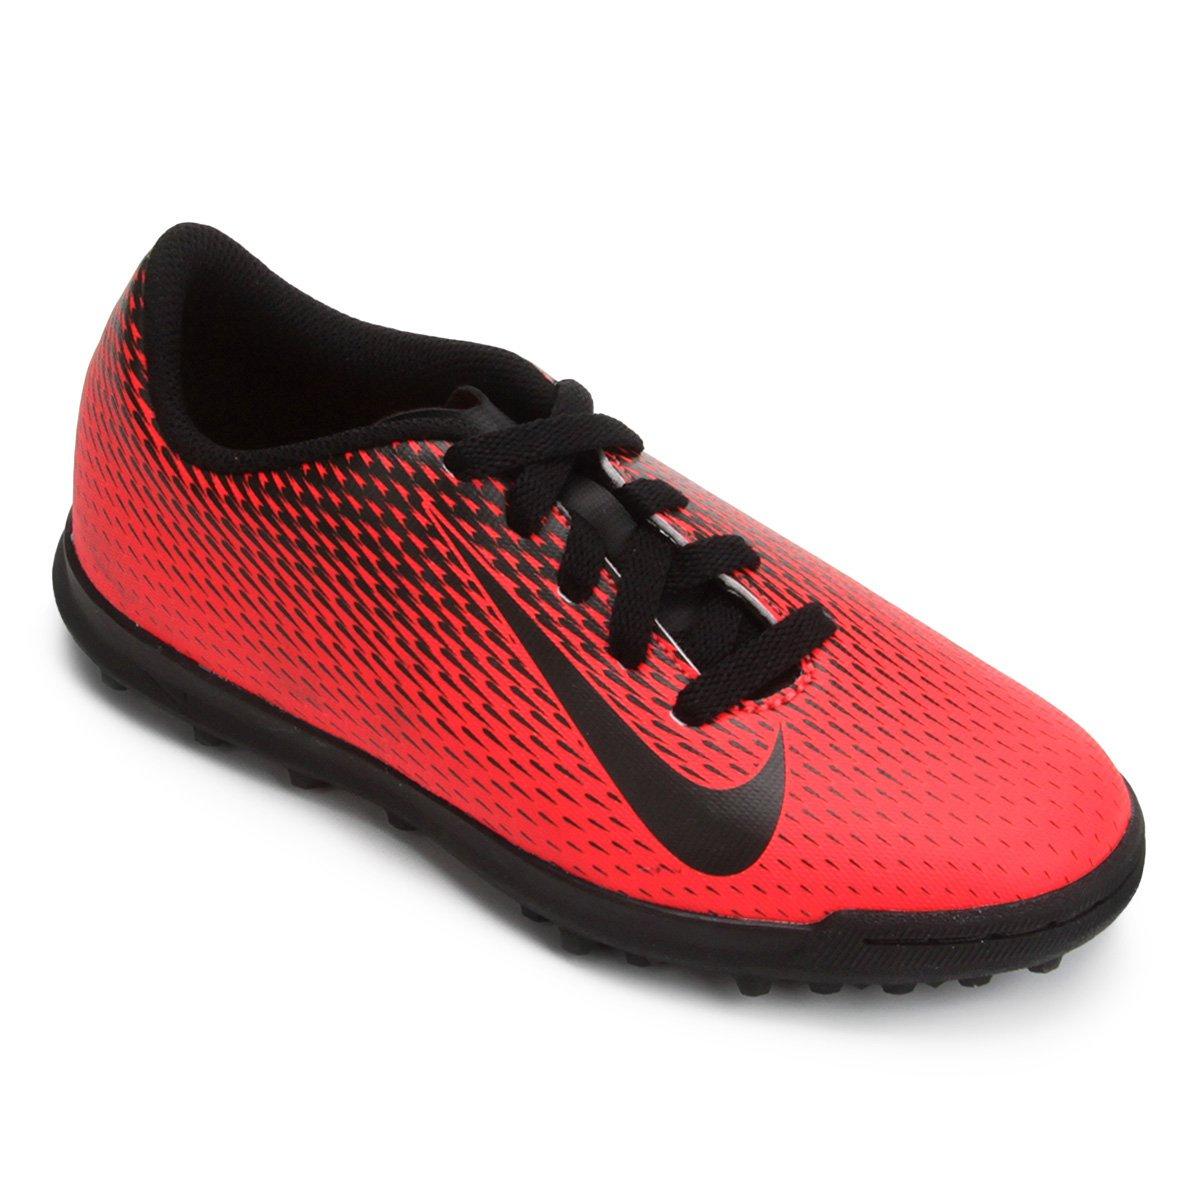 Chuteira Society Infantil Nike Bravata 2 TF - Preto - Compre Agora ... 353080f9e9b20